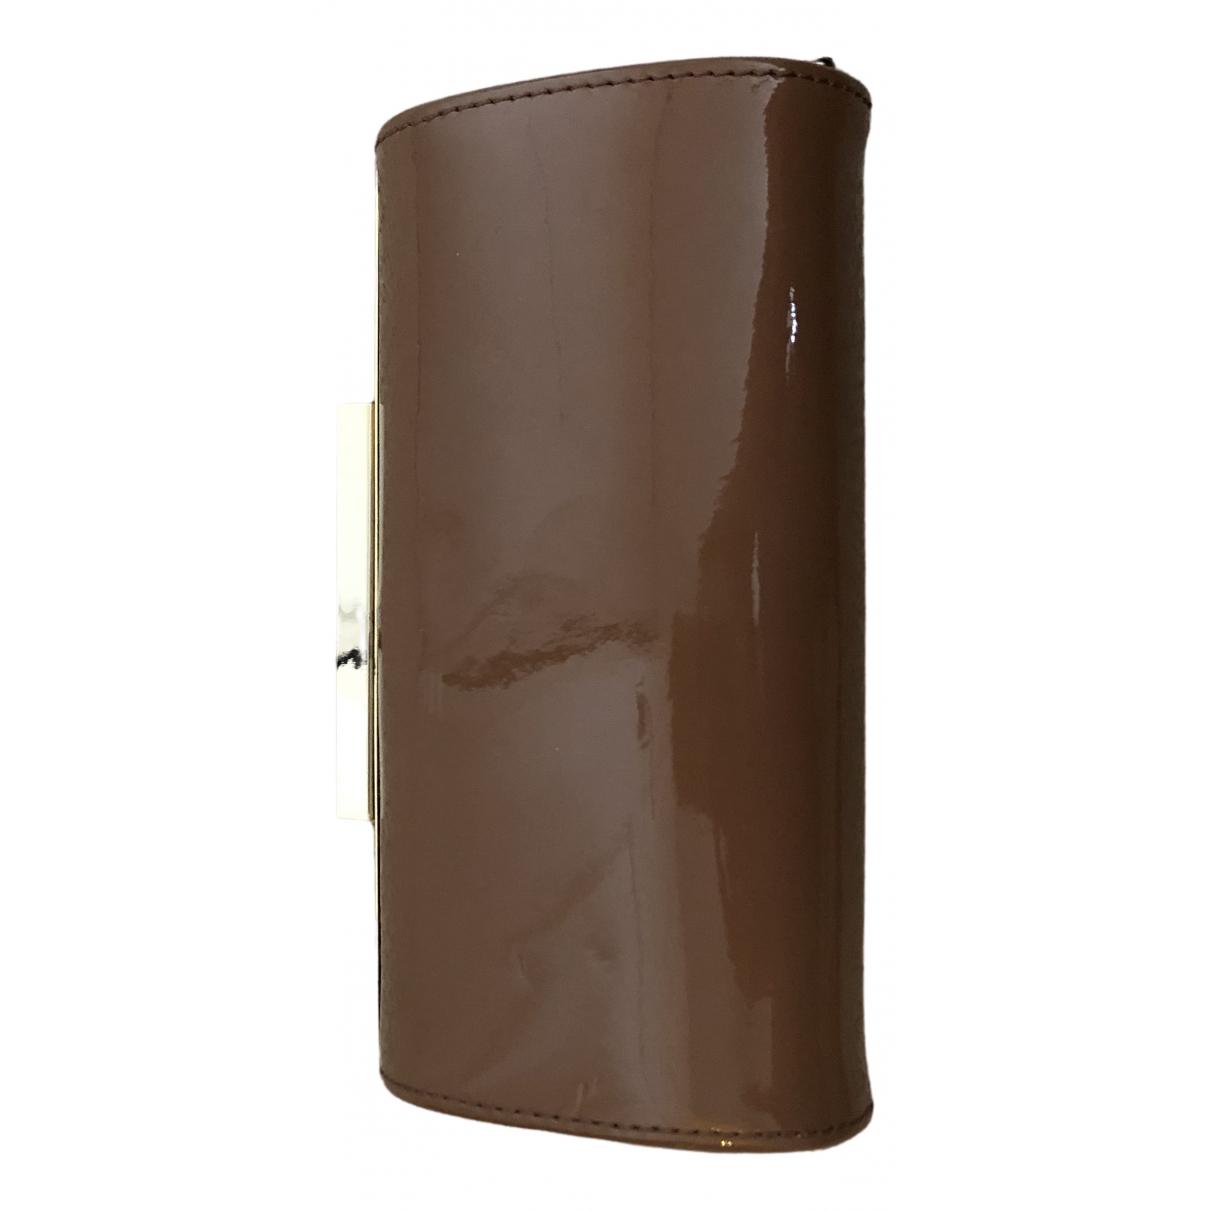 Lk Bennett \N Pink Patent leather Clutch bag for Women \N